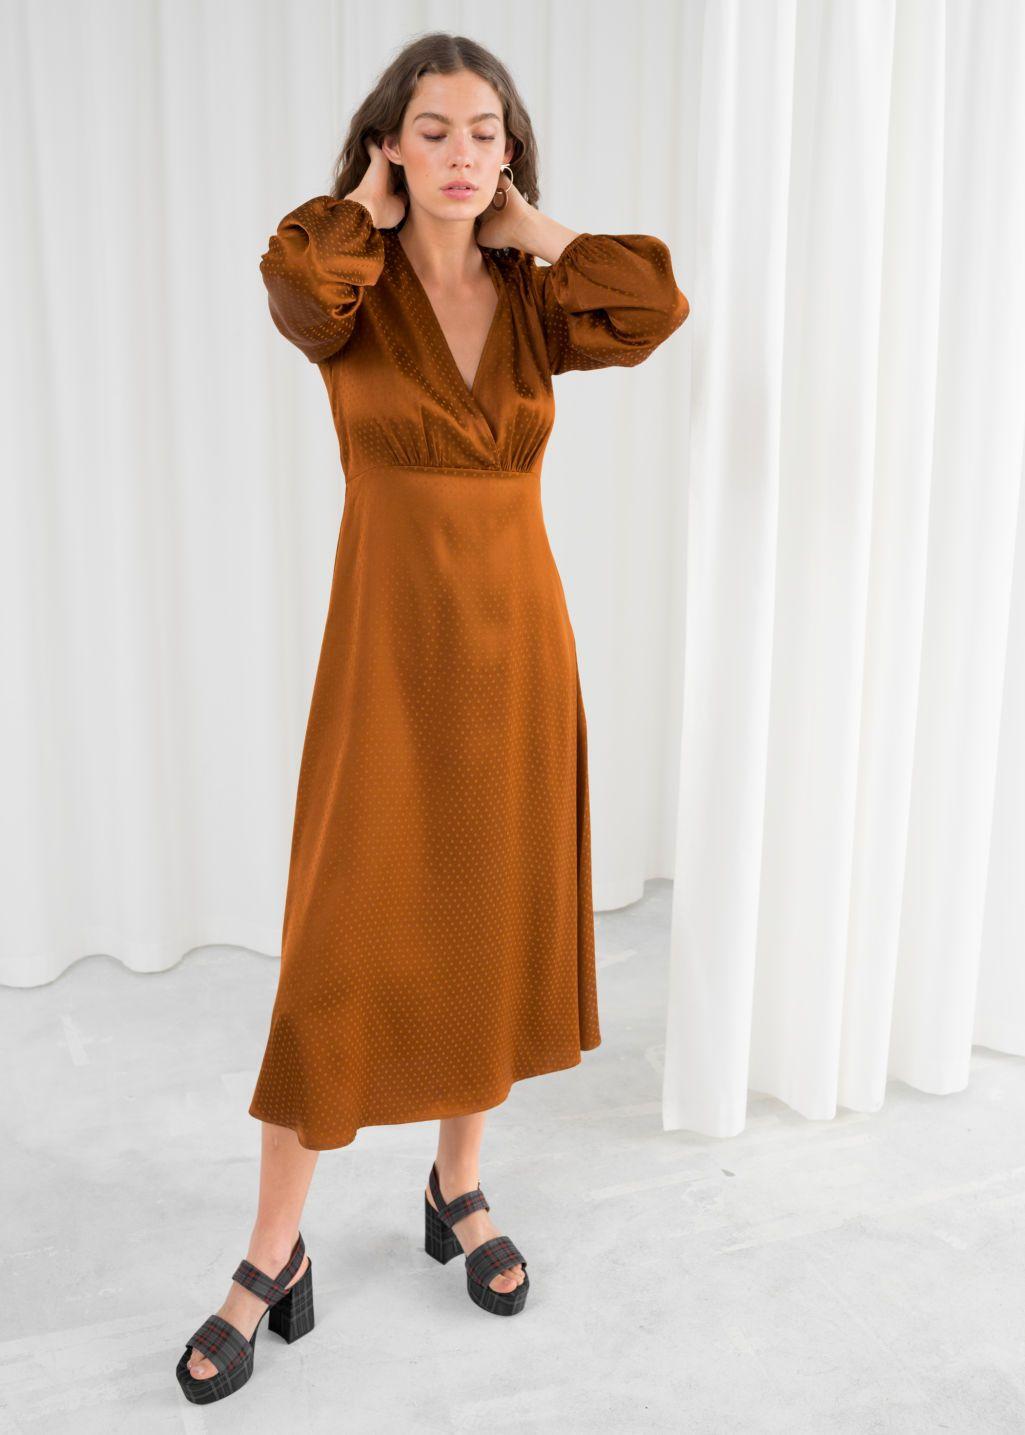 Jacquard Empire Midi Dress  Engagement party dresses, Maxi dress